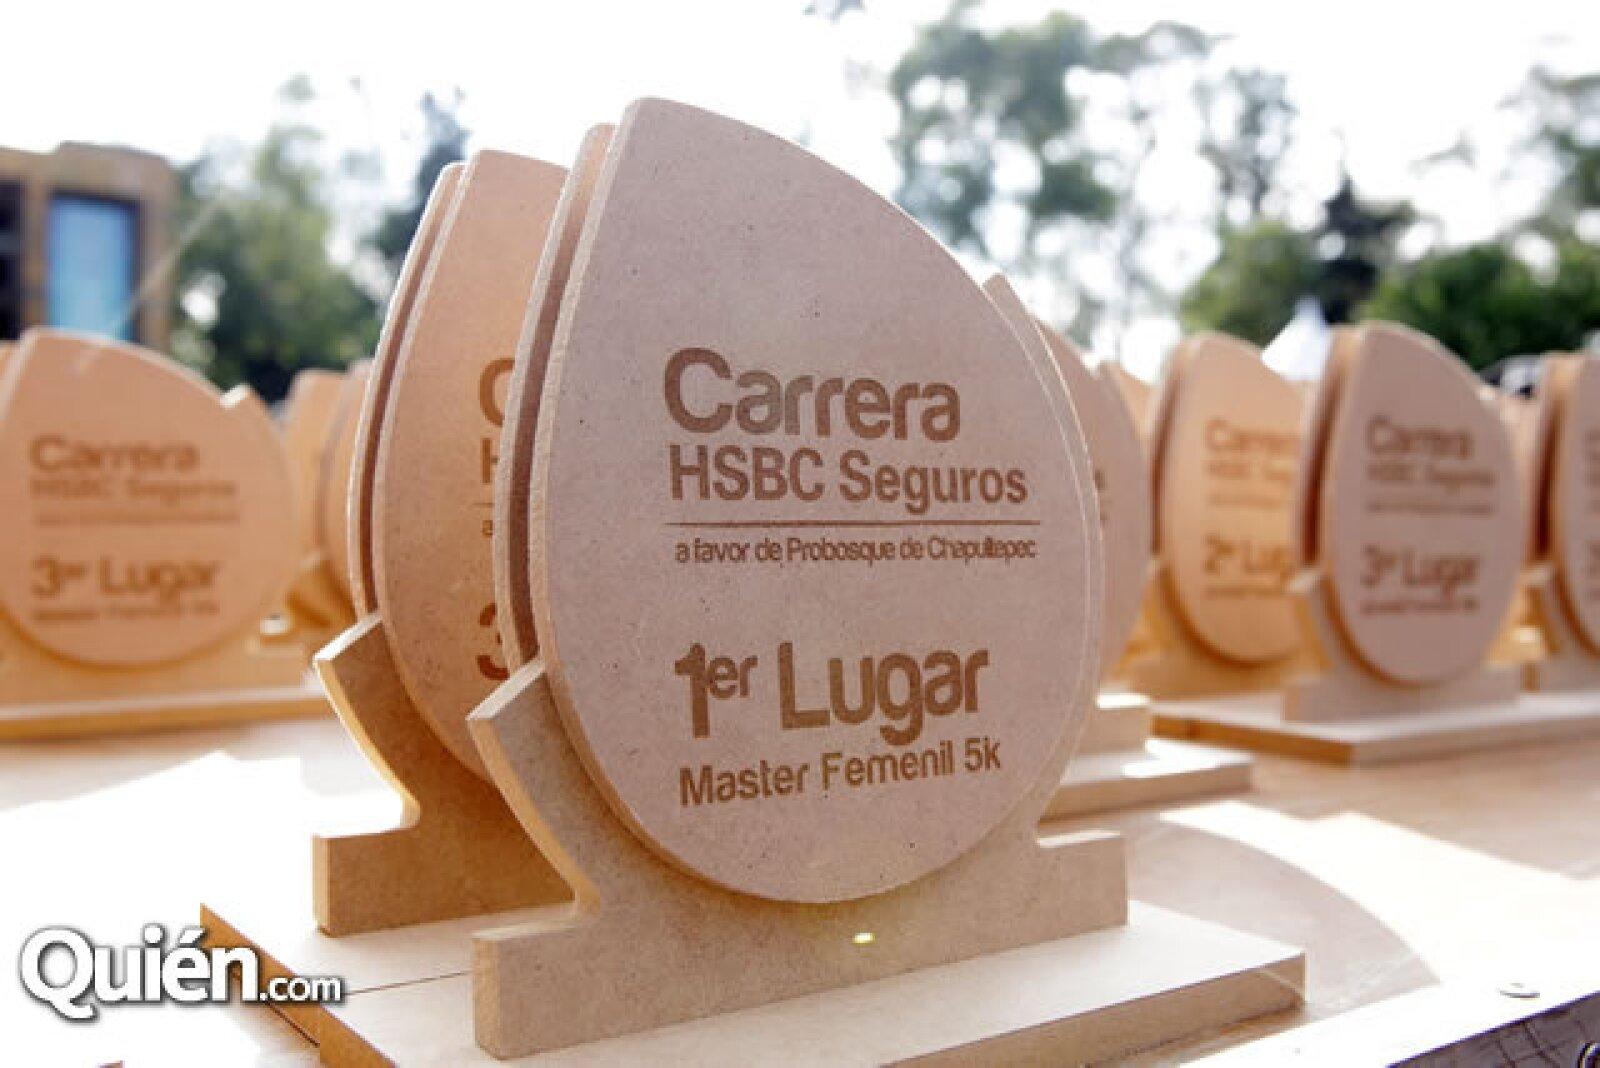 Carrera HSBC